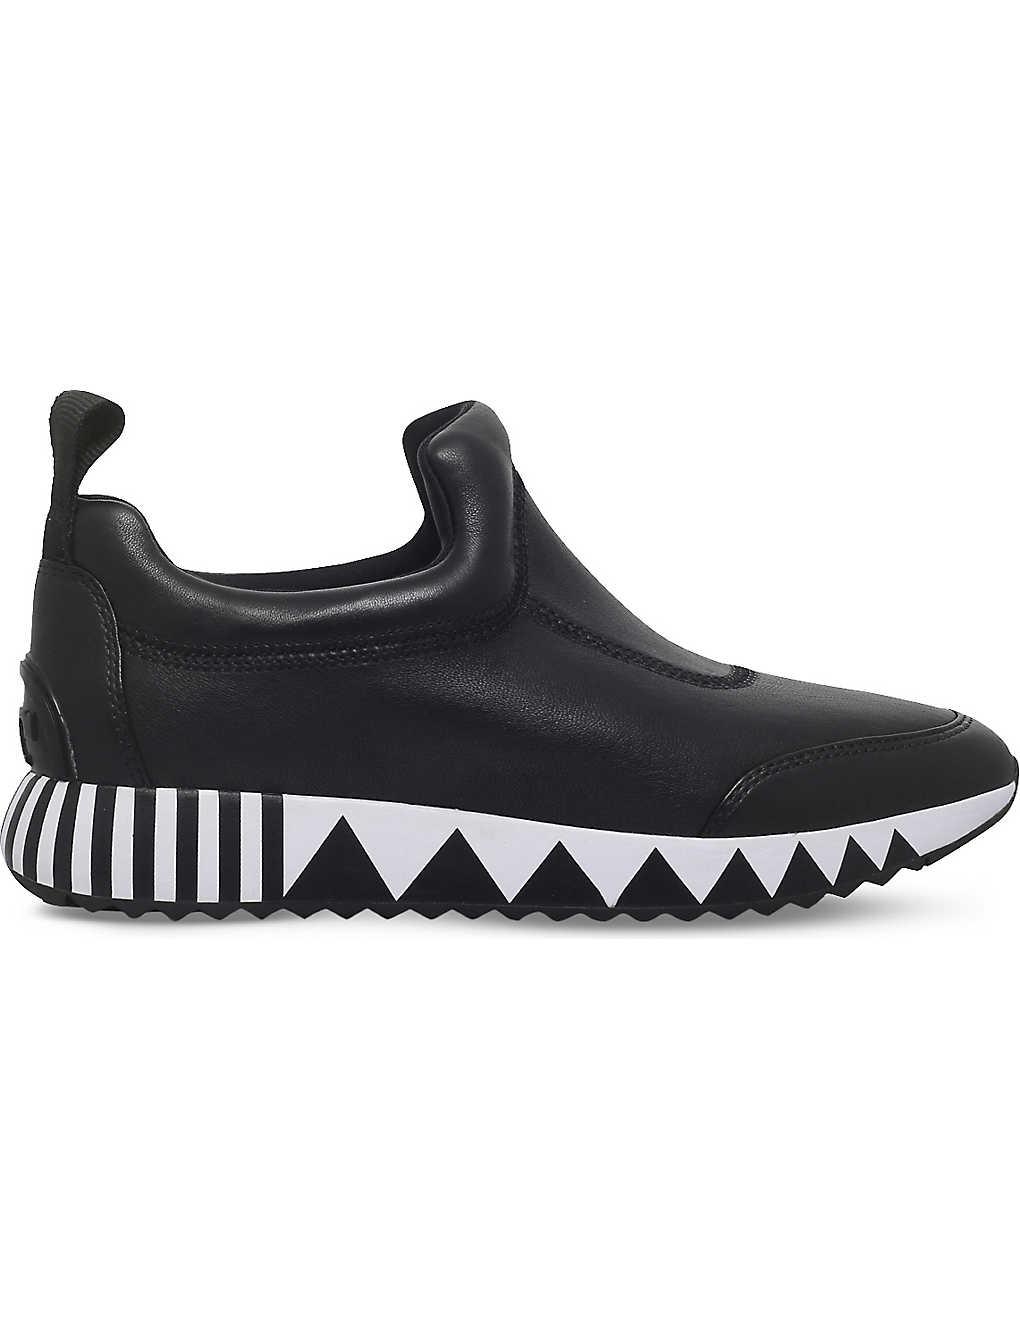 26a70474a0b8c0 TORY BURCH - Jupiter slip on sneaker